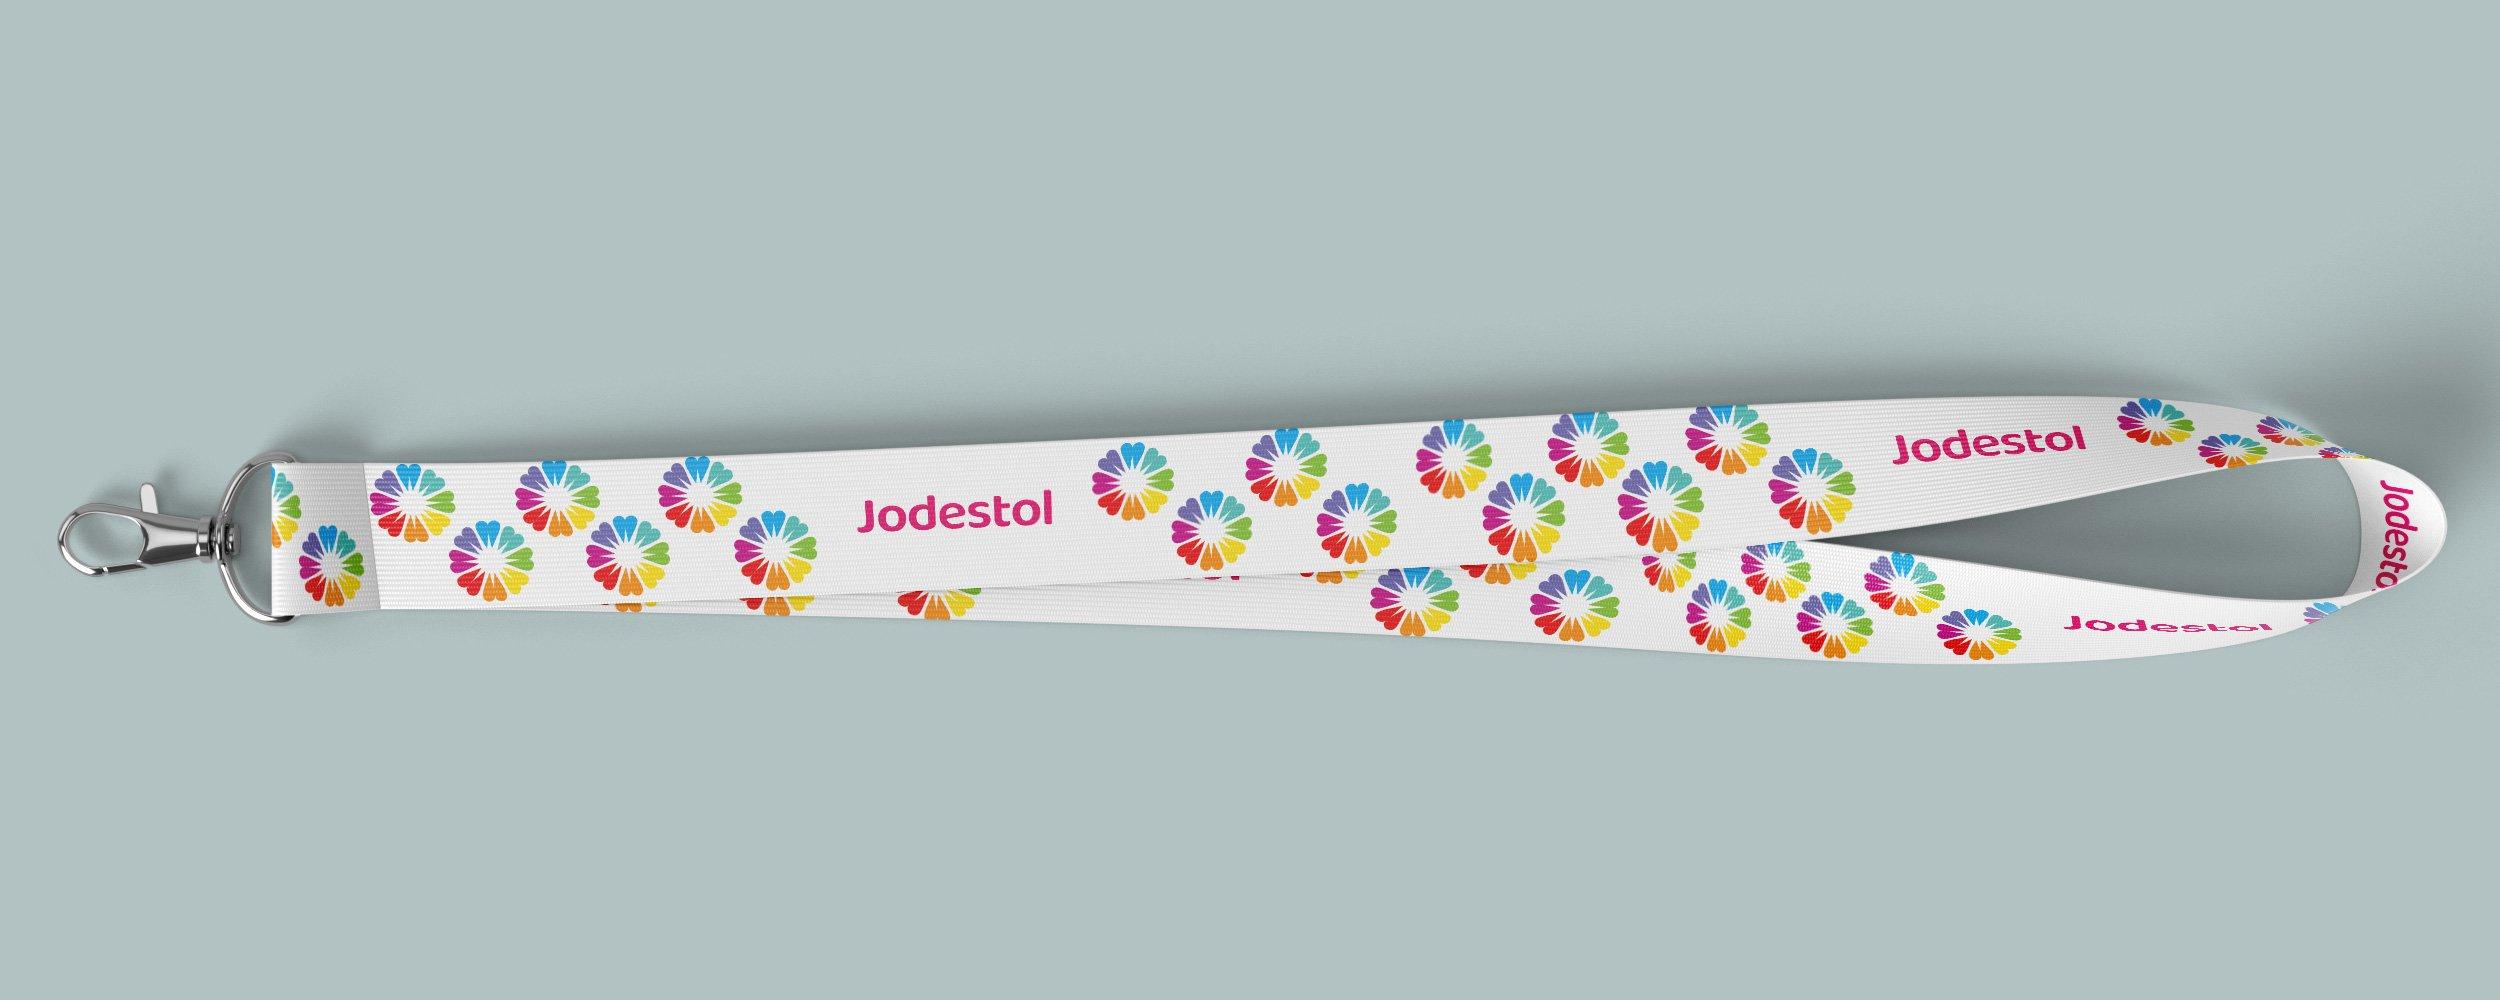 Jodestol-smycz